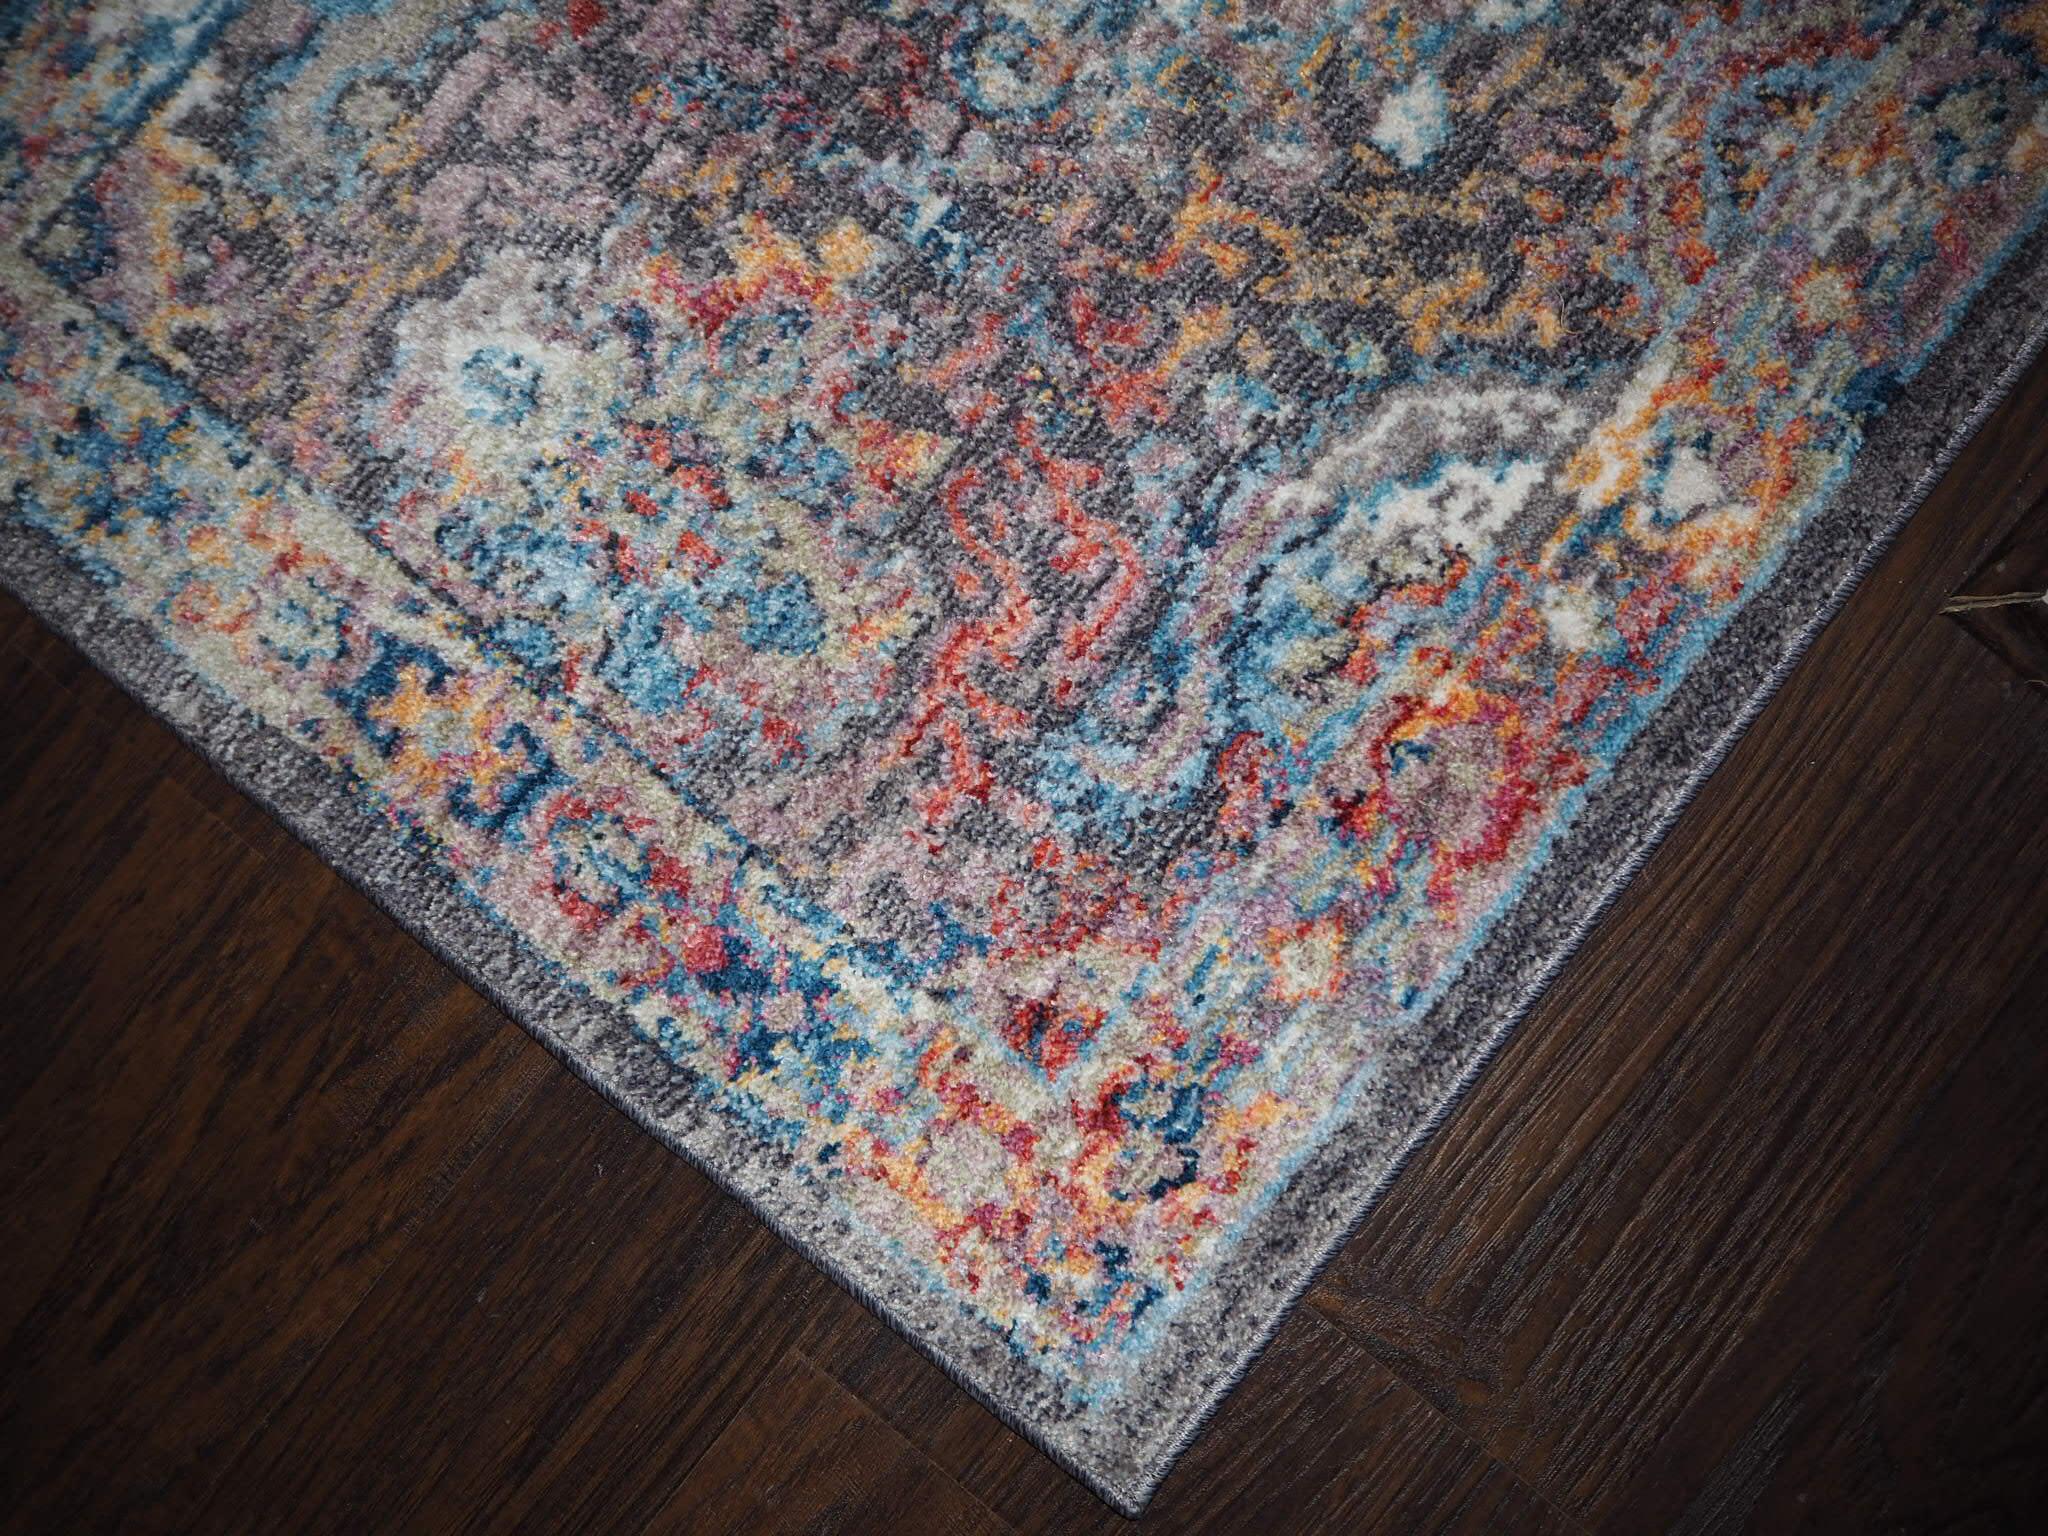 Wayfair Safavieh cosy rug update